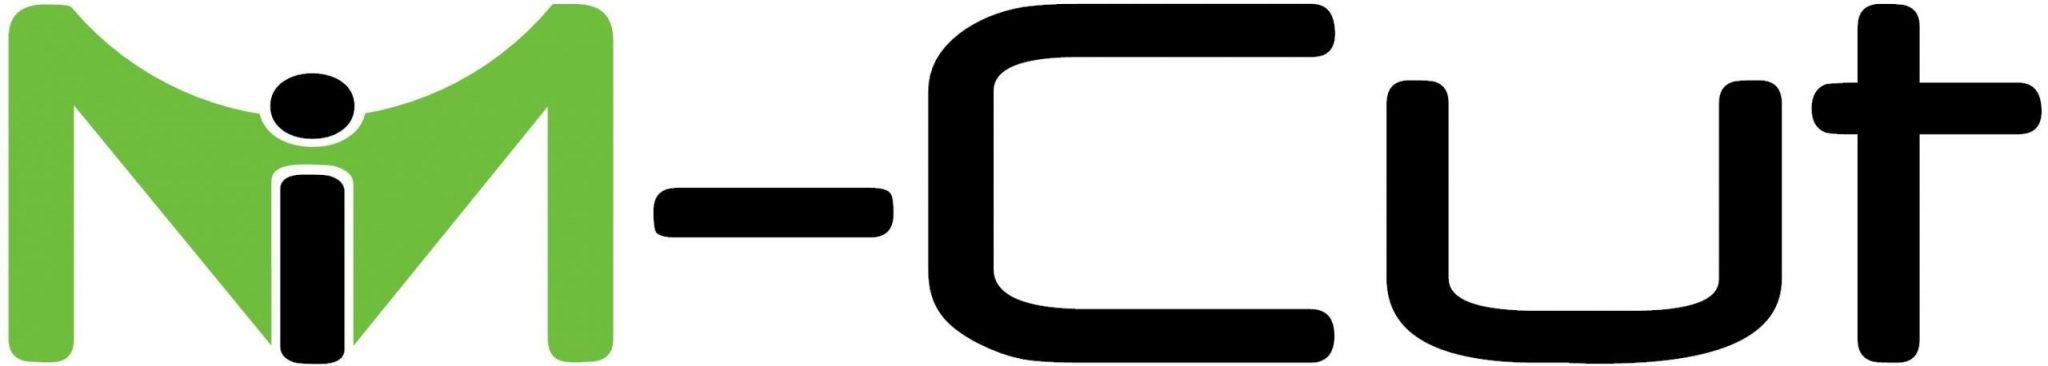 iM-Cut CNC Portalfräsmaschinen | einfache Bedienung | flexibel | günstig